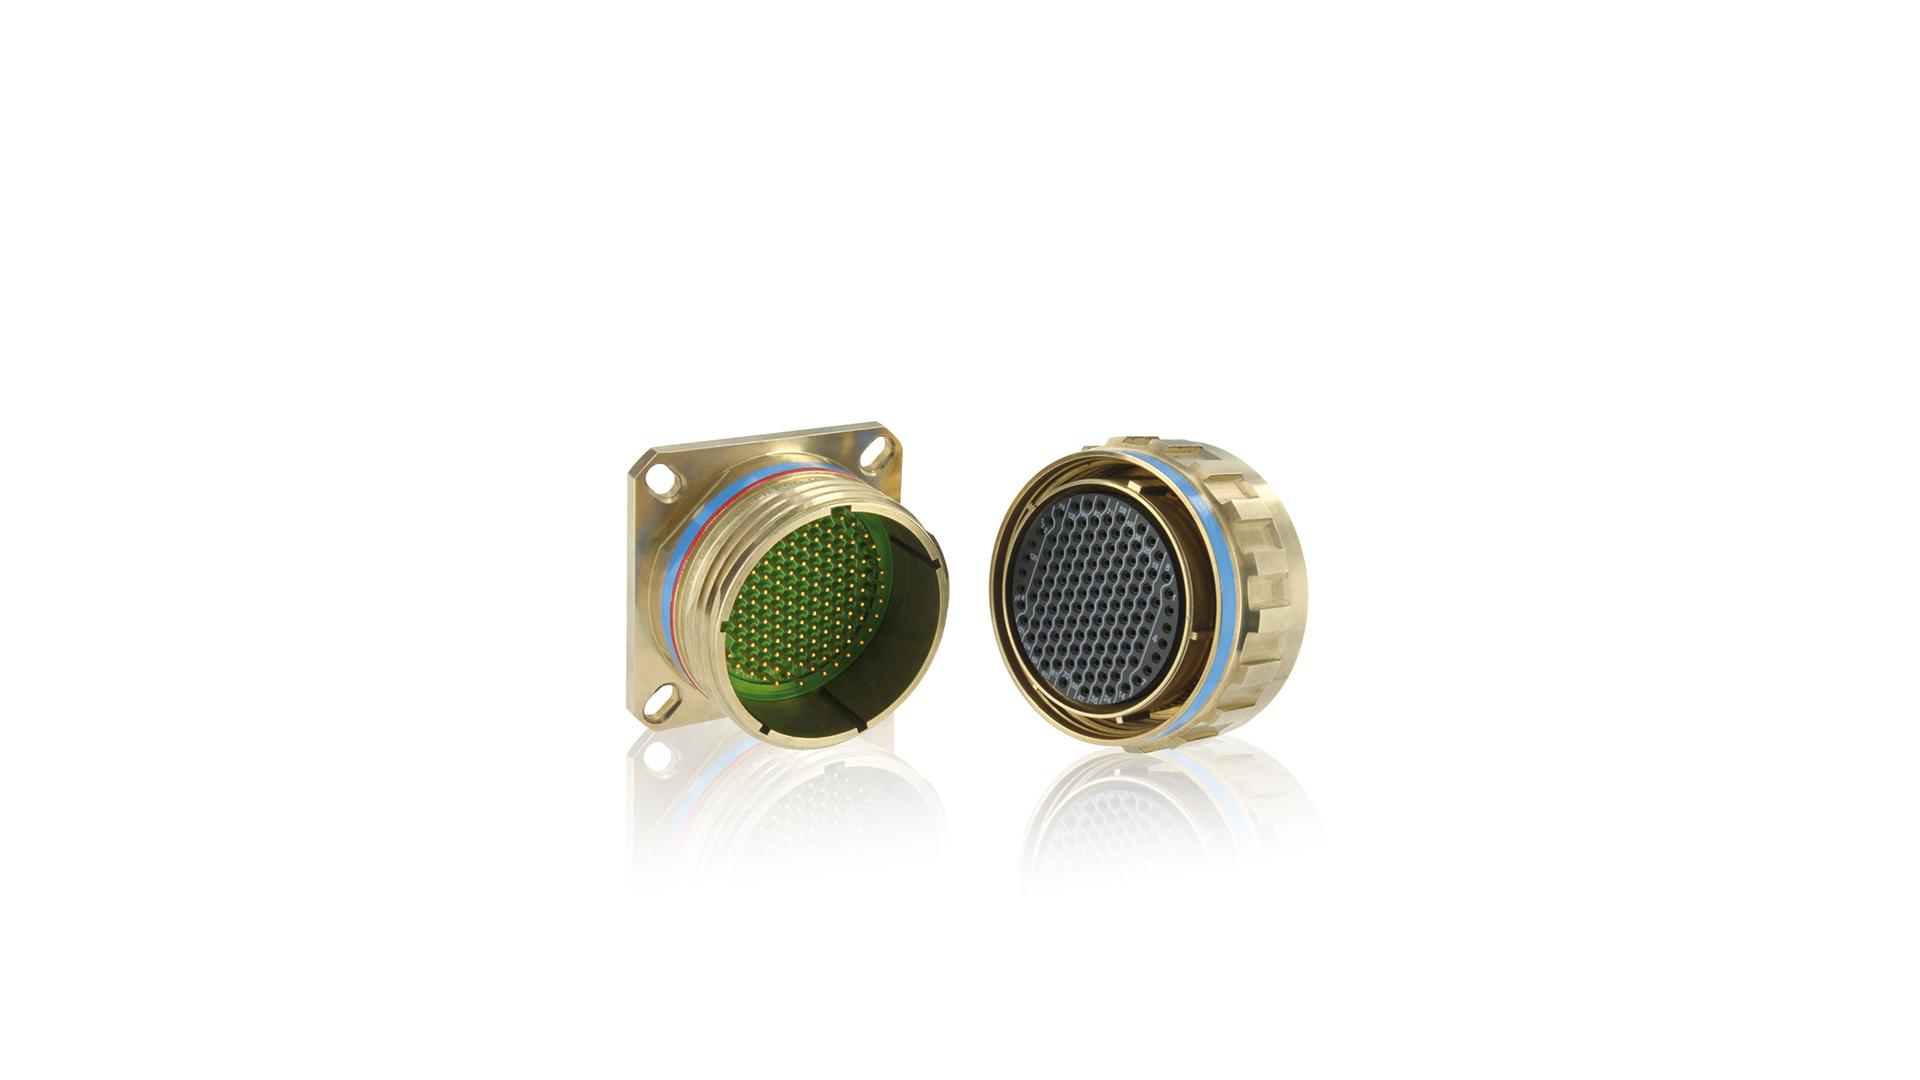 Bronze CECC connectors